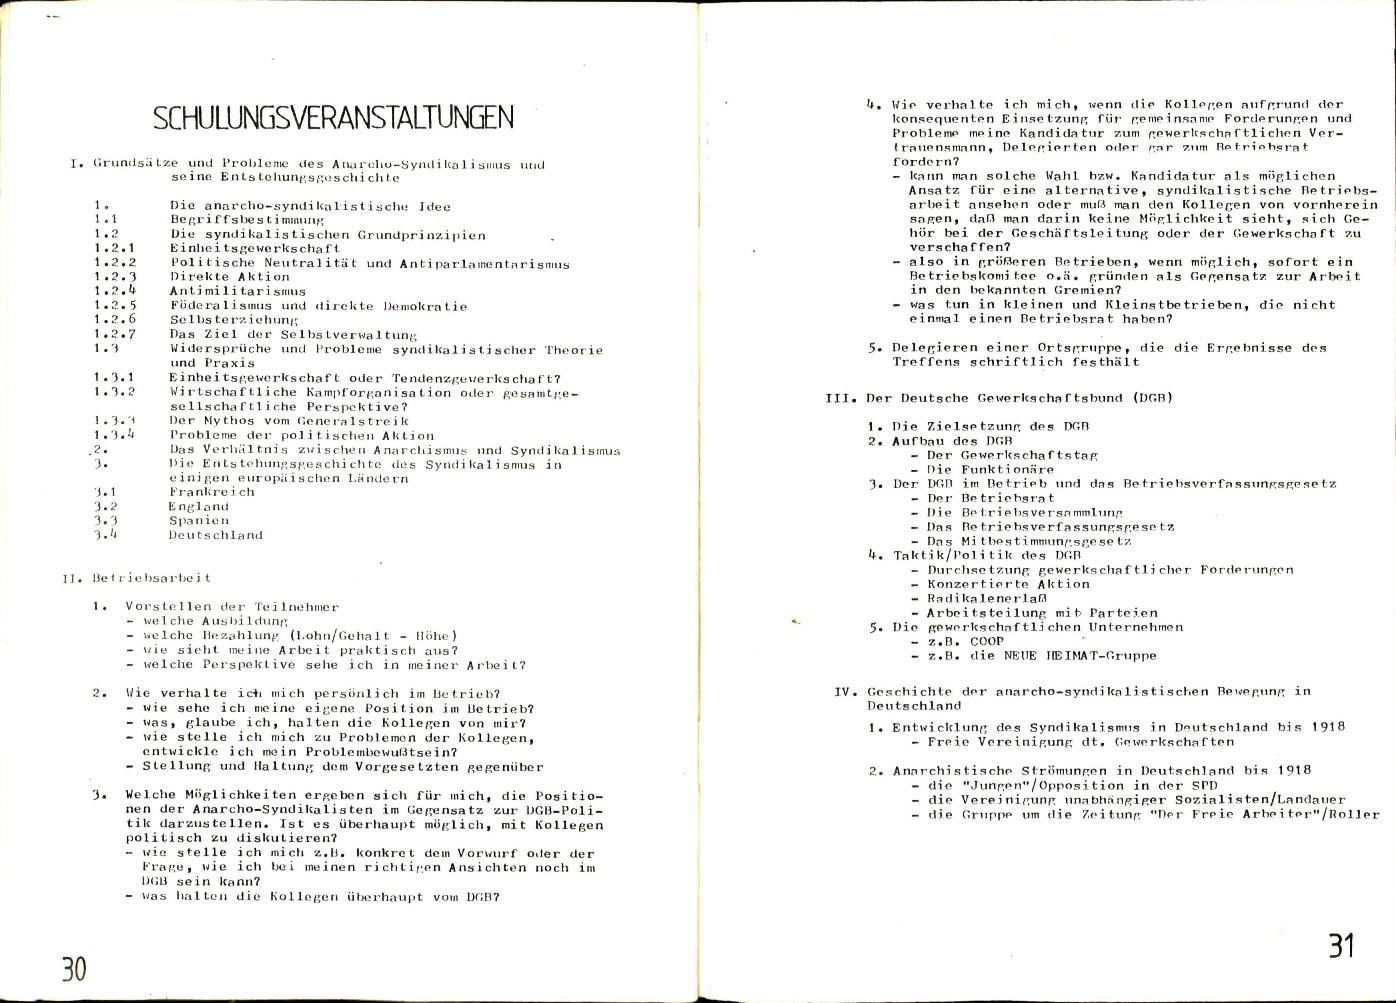 FAU_1979_Arbeitsgrundlage_16